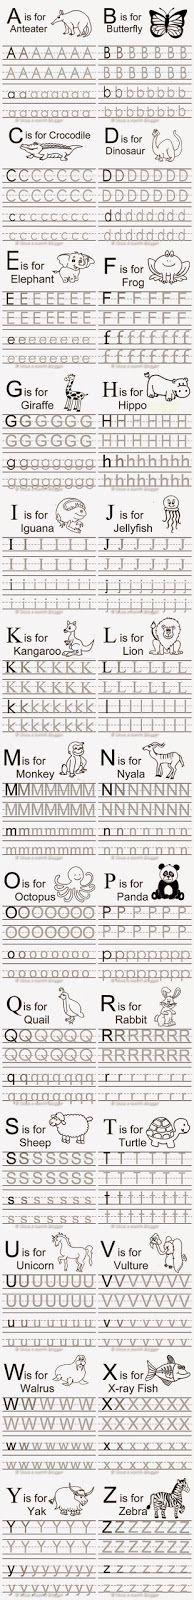 Free Animal Alphabet Traceable Letters More Preschool Letters, Letter Activities, Learning Letters, Preschool Kindergarten, Preschool Worksheets, Preschool Learning, Preschool Activities, Tracing Letters, Alphabet Letters